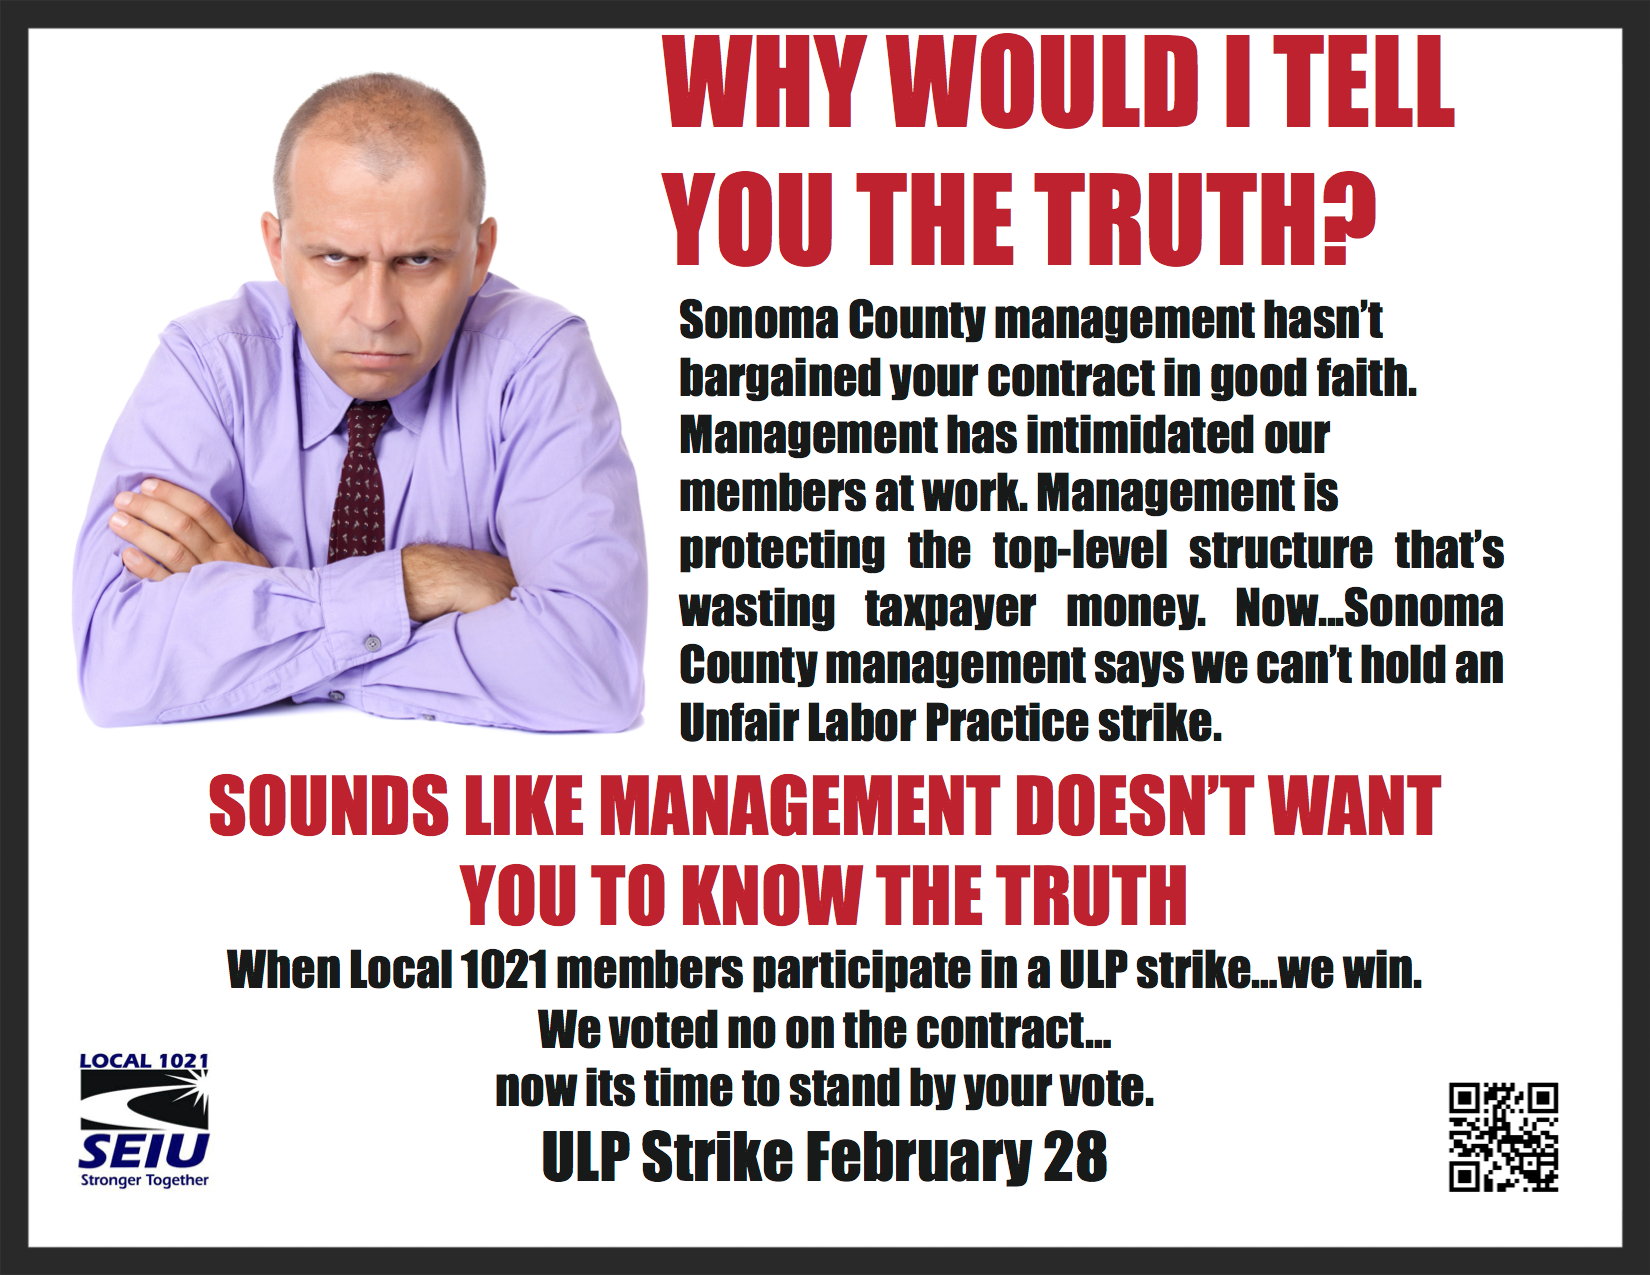 Promo for Sonoma County contract negotiations at SEIU Local 1021.